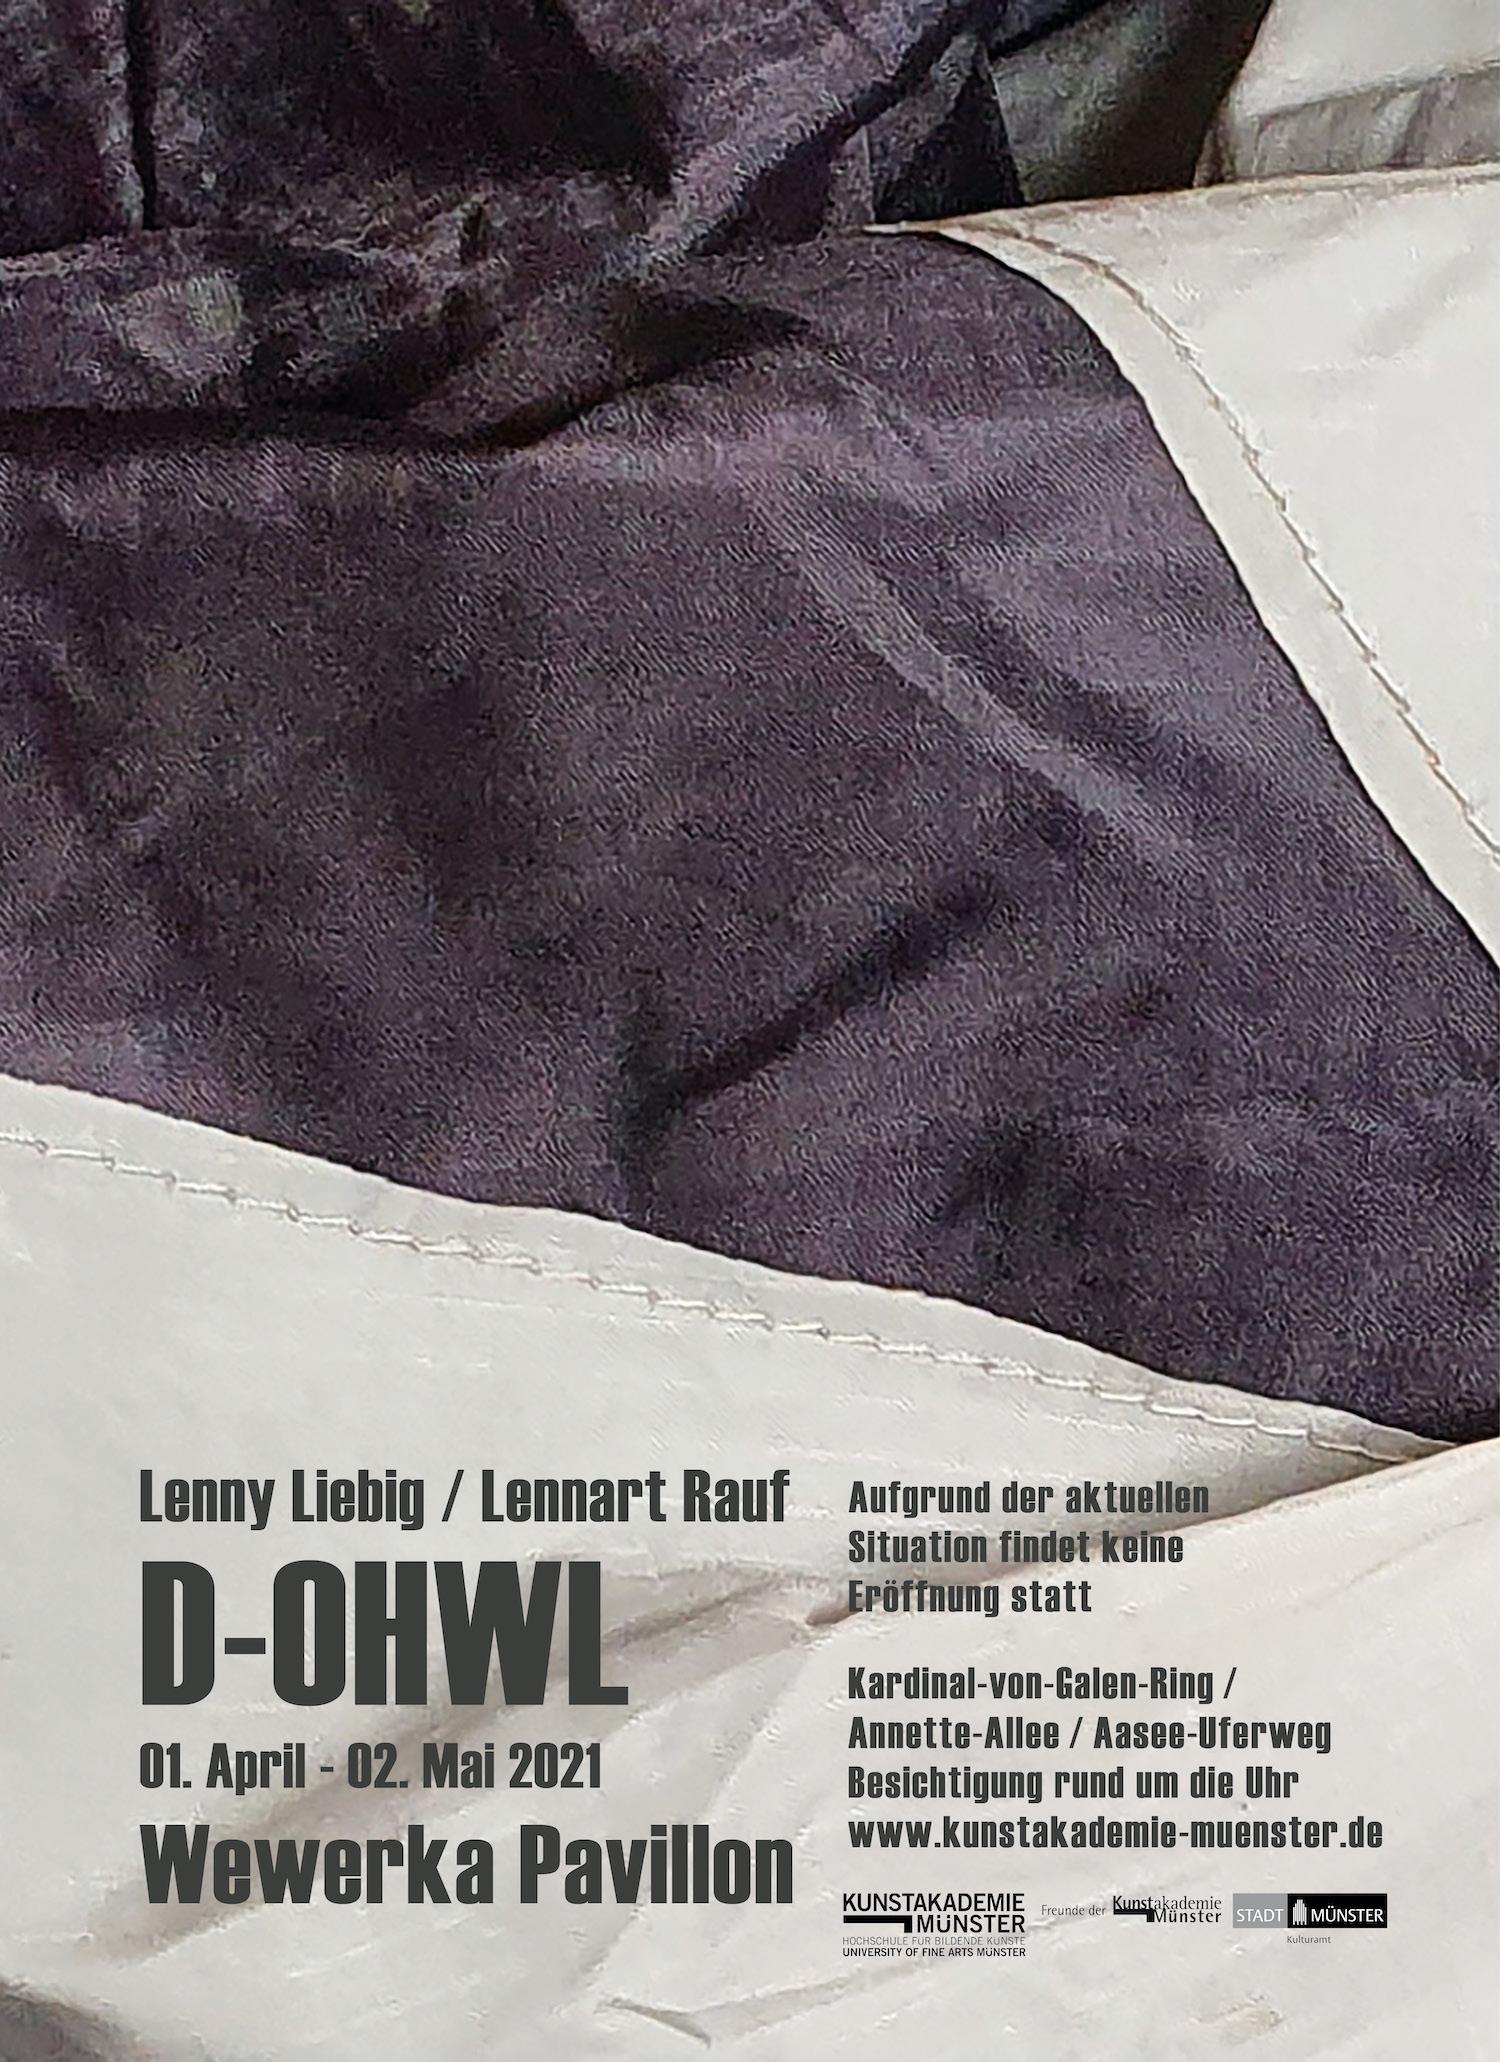 Eventbild für Lenny Liebig und Lennart Rauf /// D-OHWL